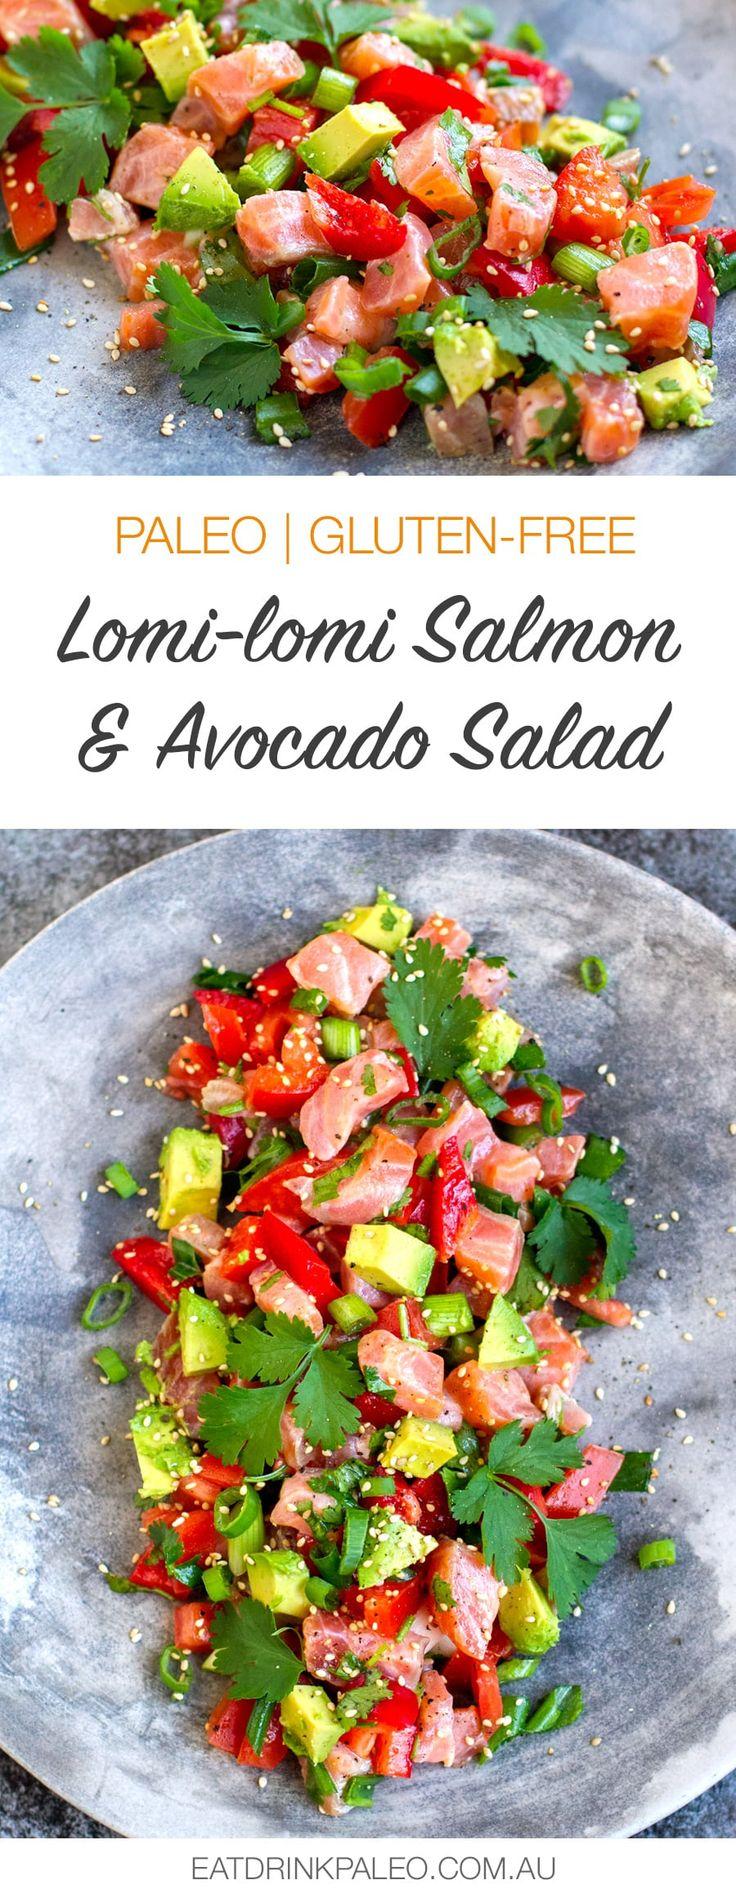 Paleo Lomi-Lomi Salmon & Avocado Salad